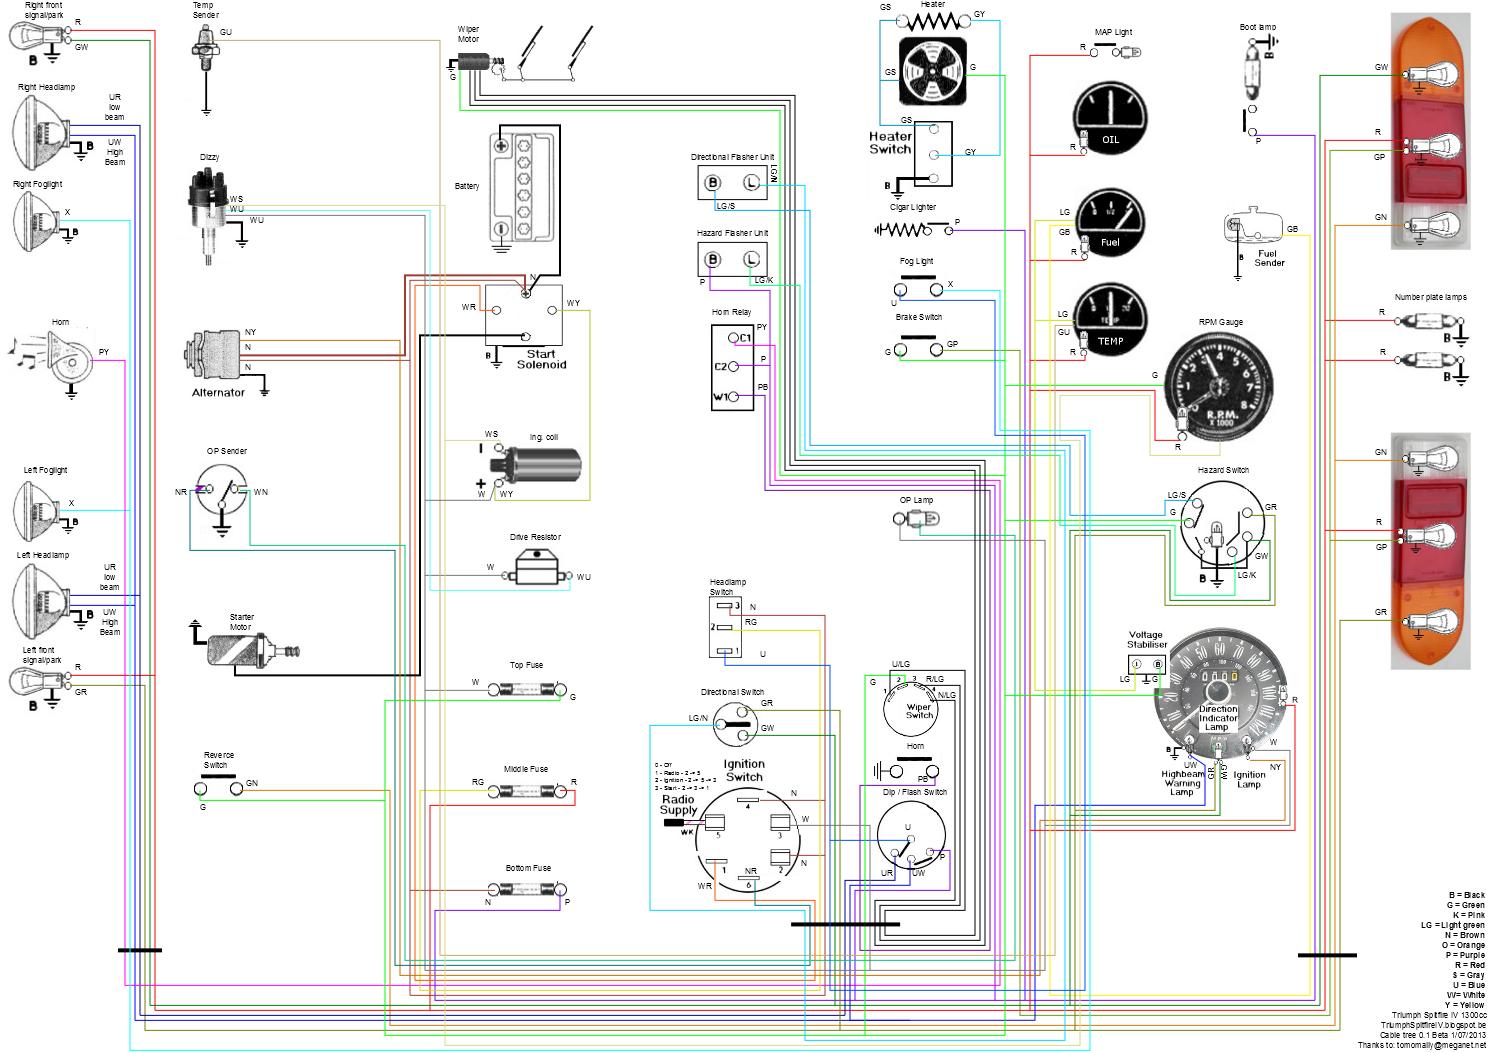 [DIAGRAM_1CA]  Triumph Tr3 Color Wiring Diagram - 3 Off Road Light Wiring Harness for Wiring  Diagram Schematics | Triumph Tr6 Wiring Diagram |  | Wiring Diagram and Schematics